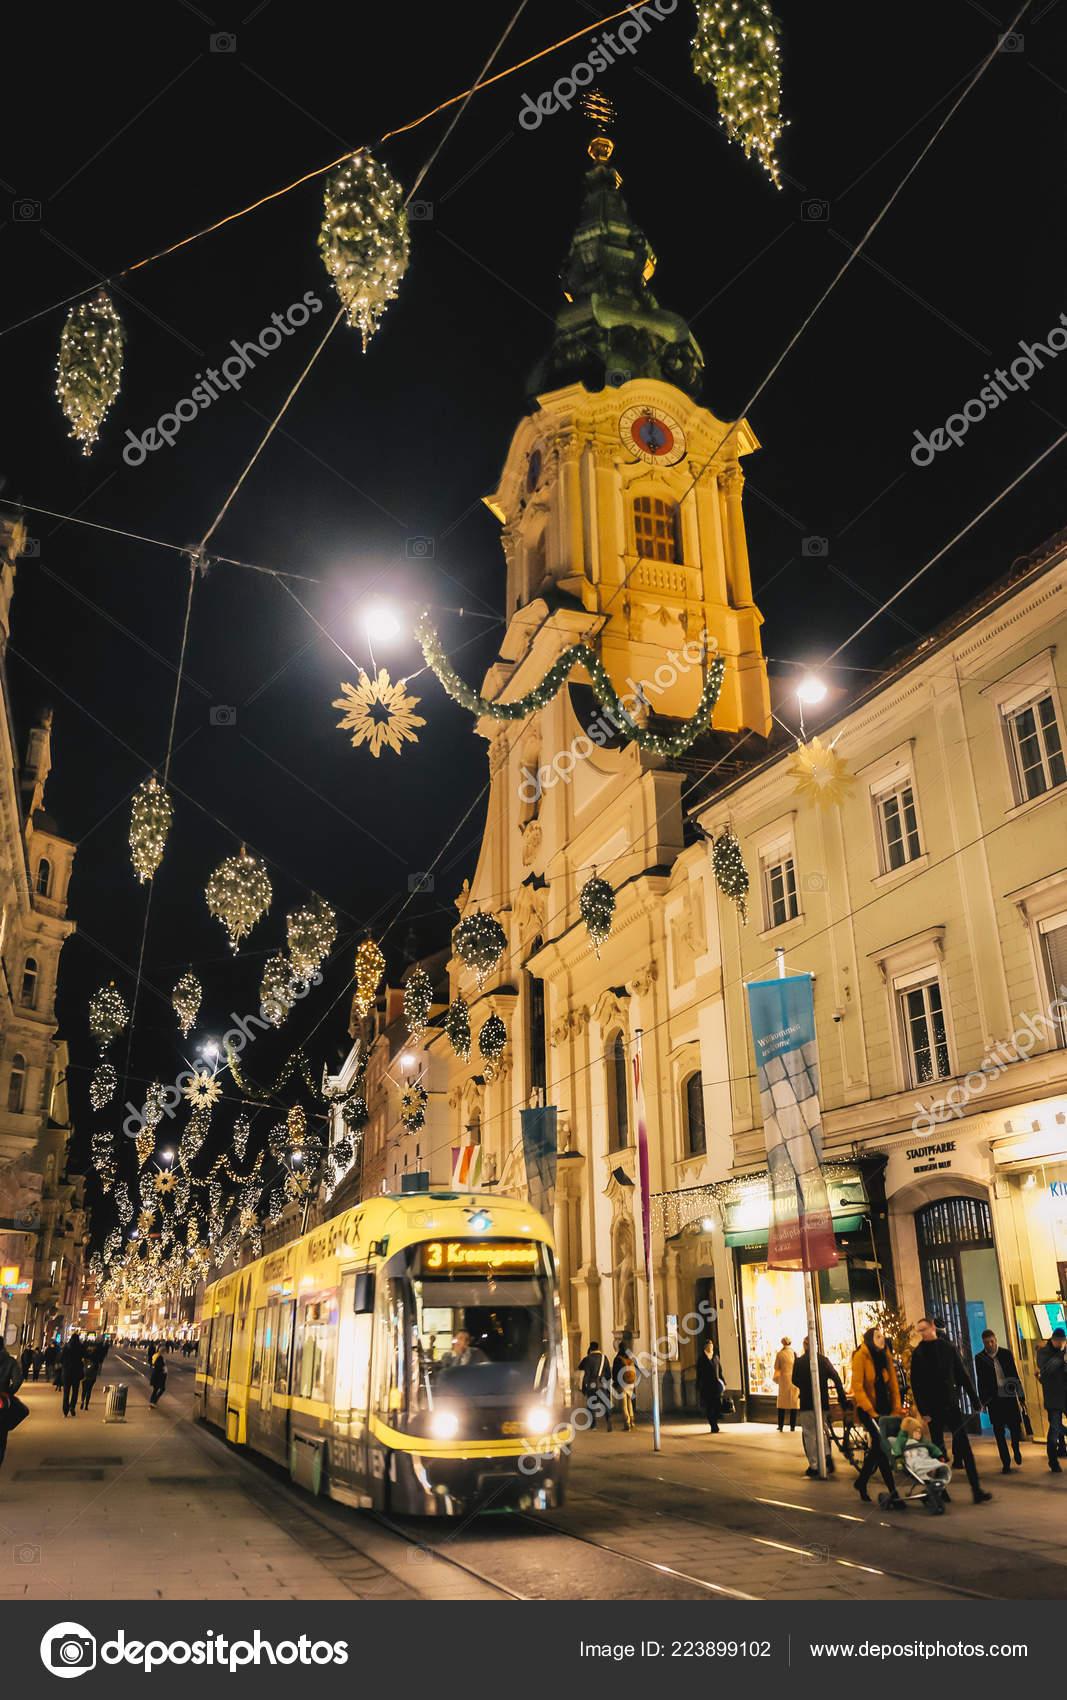 Christmas In Austria Holidays.Graz Austria December 2017 Christmas Decorations Streets